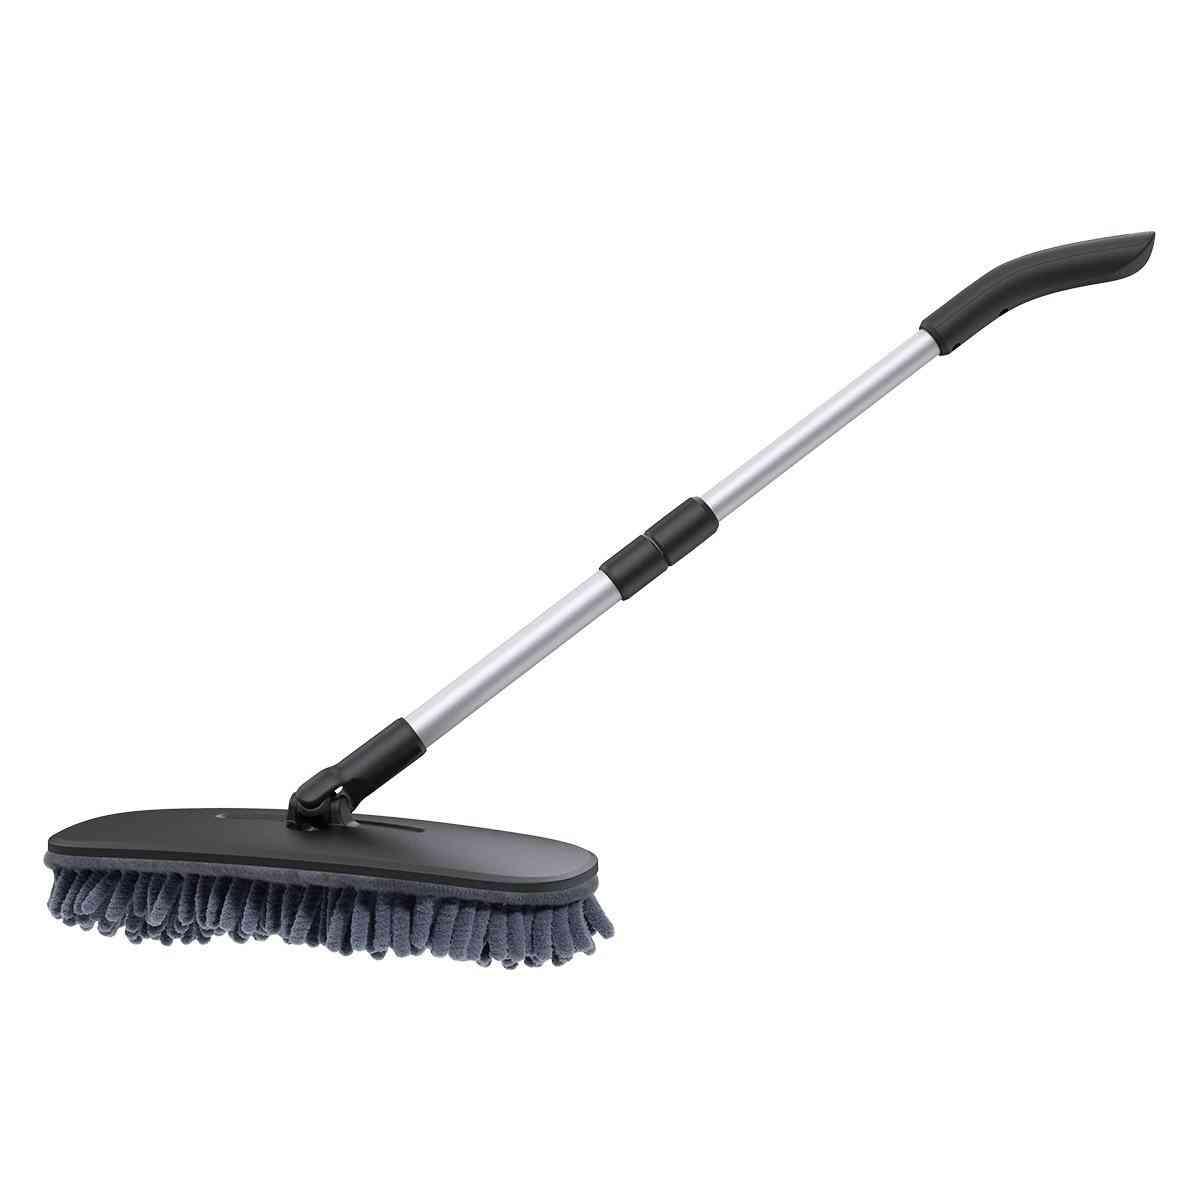 eng pl Baseus Handy Dual use car mop black 18625 3